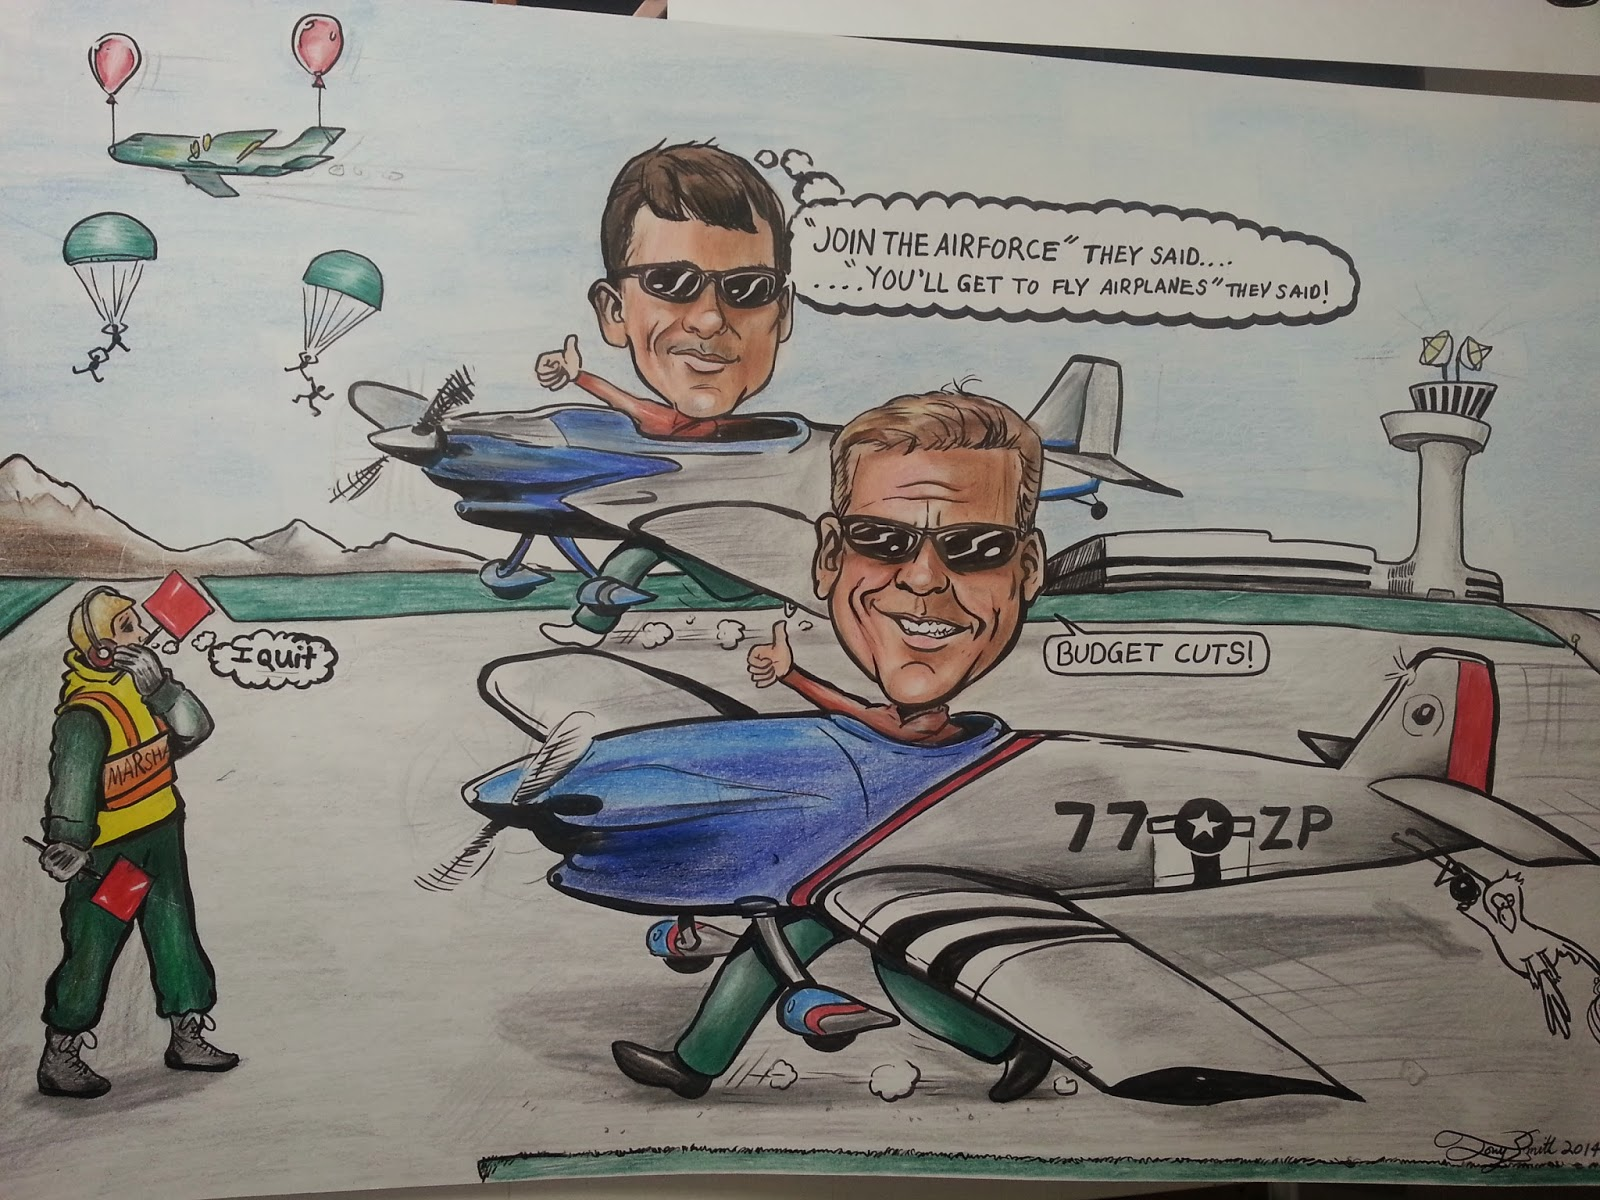 Tony Smith caricature Illustration